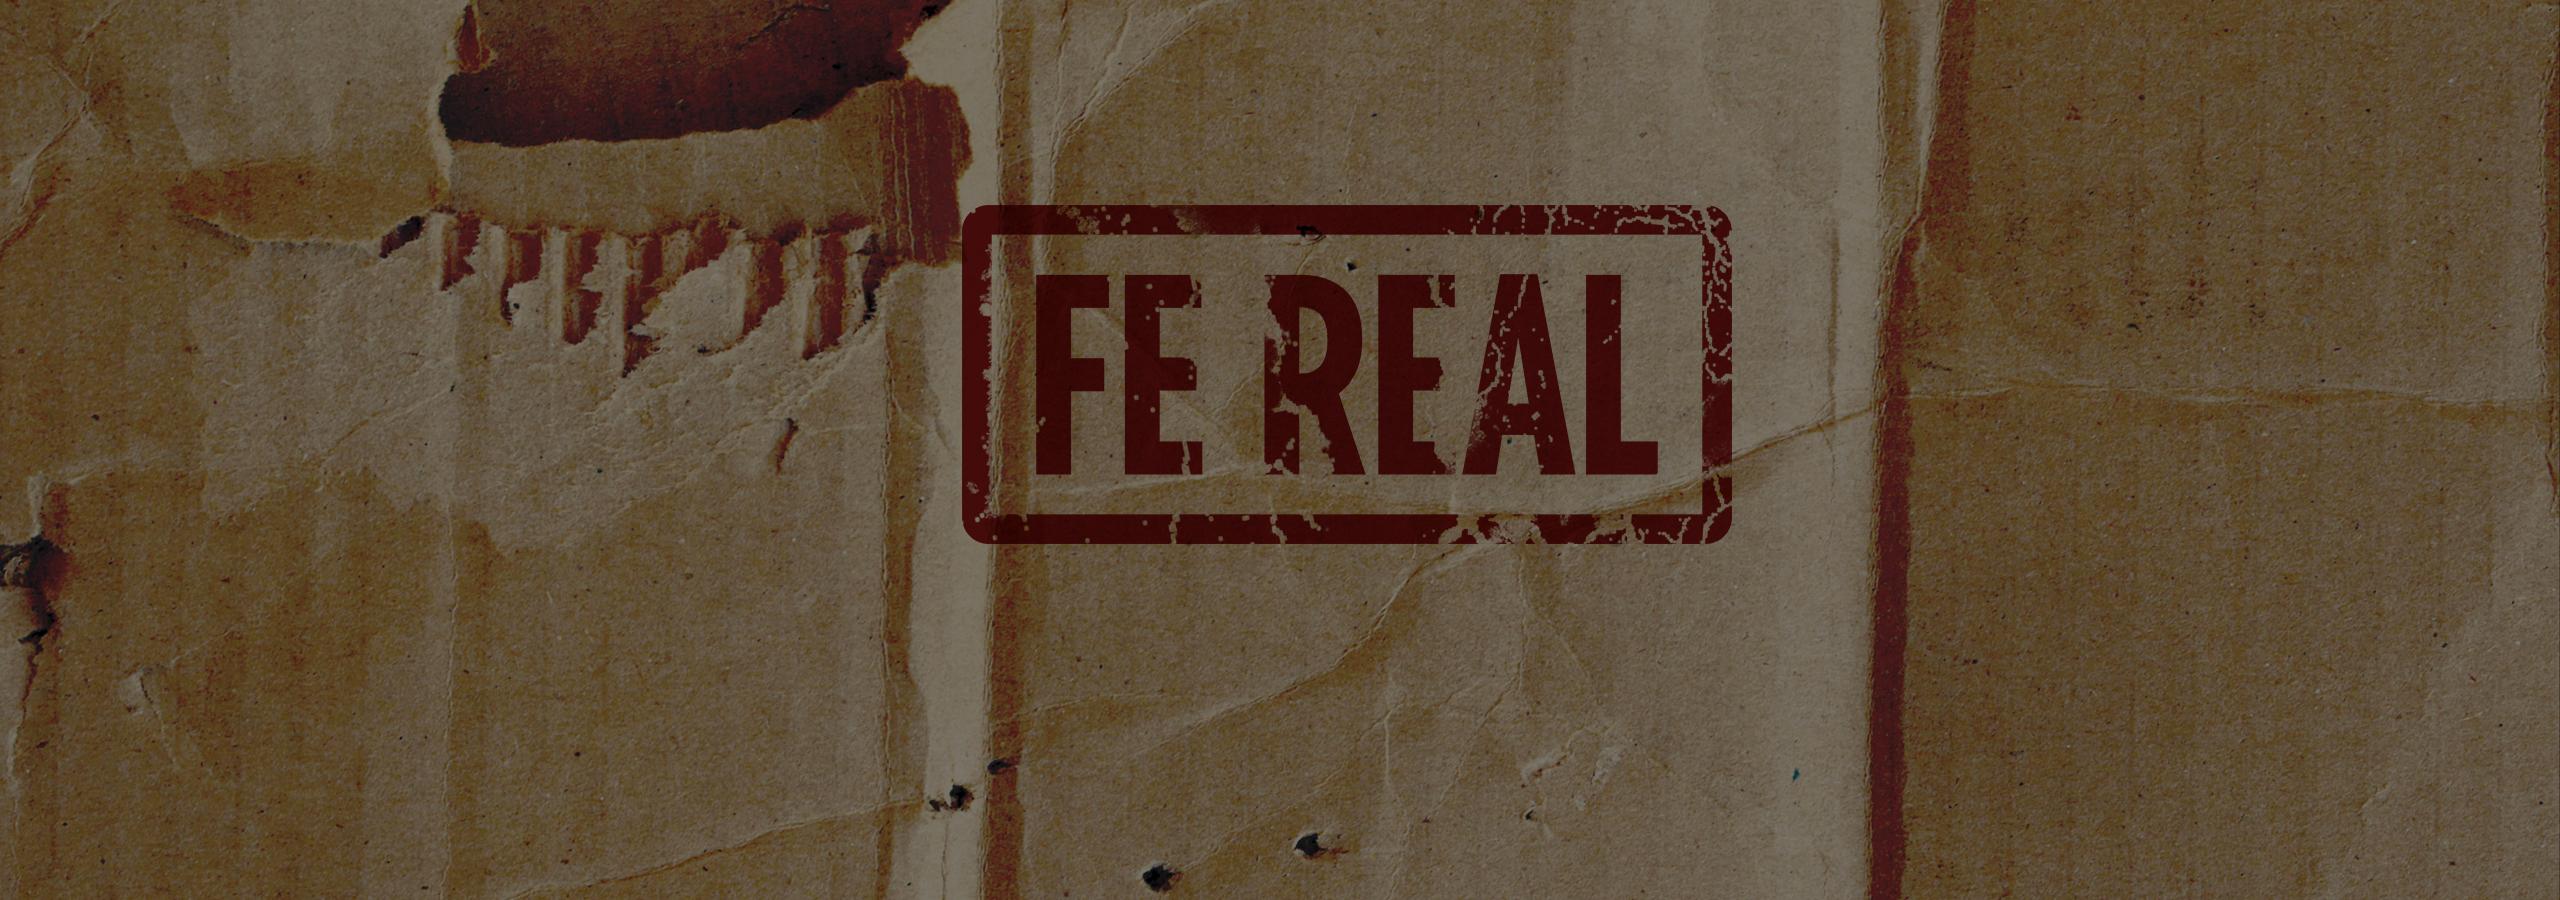 fe_real_webback.jpg